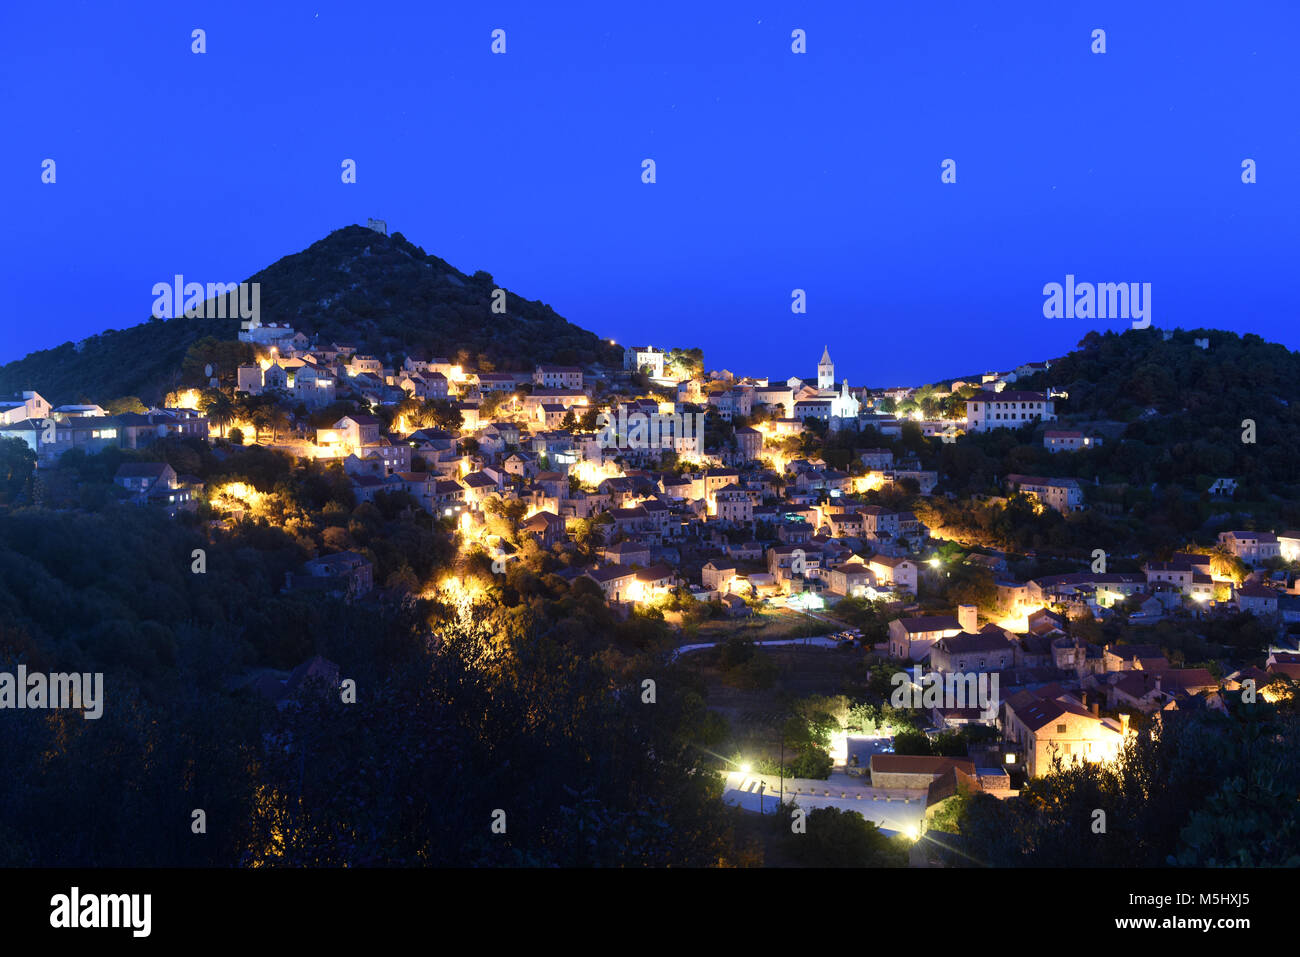 Lastovo old town at night, Lastovo island, Croatia - Stock Image